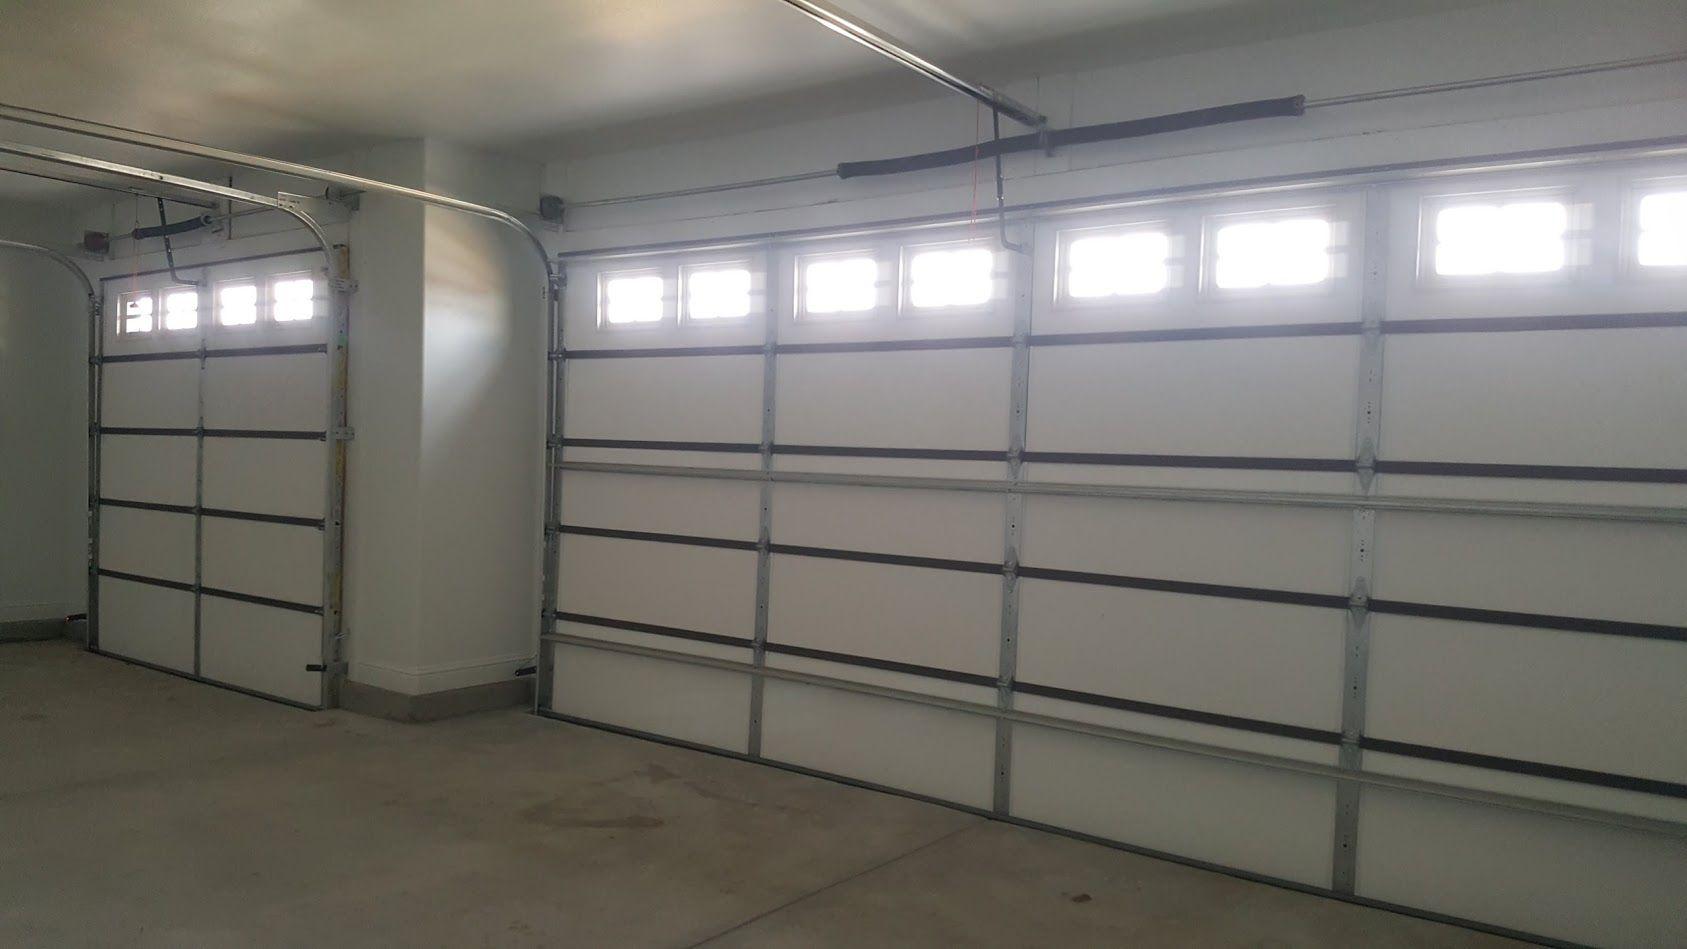 Optional Garage Insulation Garage Door Panels Ceiling And Walls Permian Homes Midland Tx Home Garage Door Panels New Homes